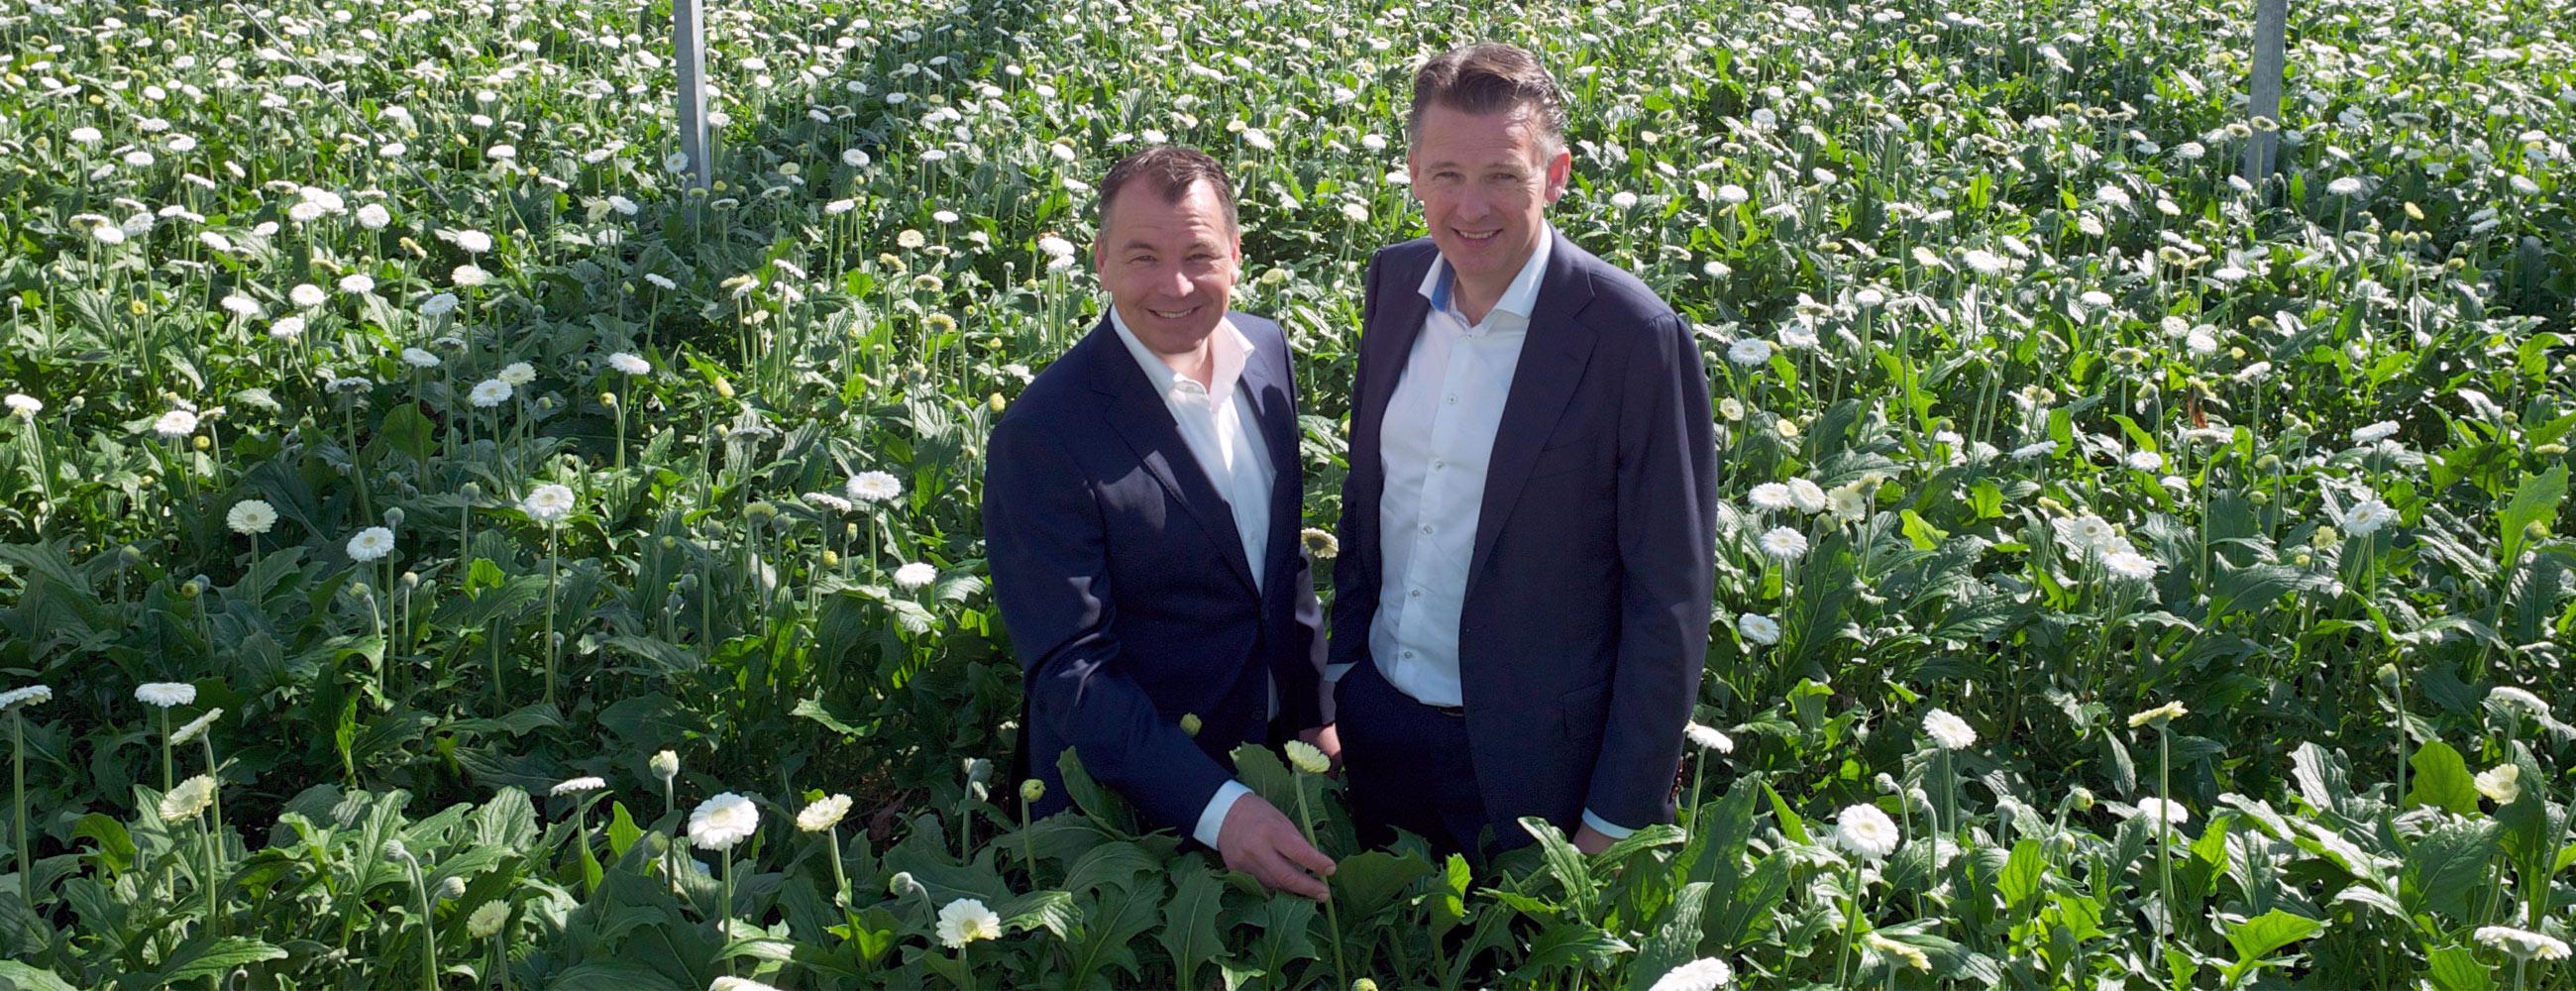 Over ons - Erik Goesten - Matthieu Opdam - Goesten en Opdam